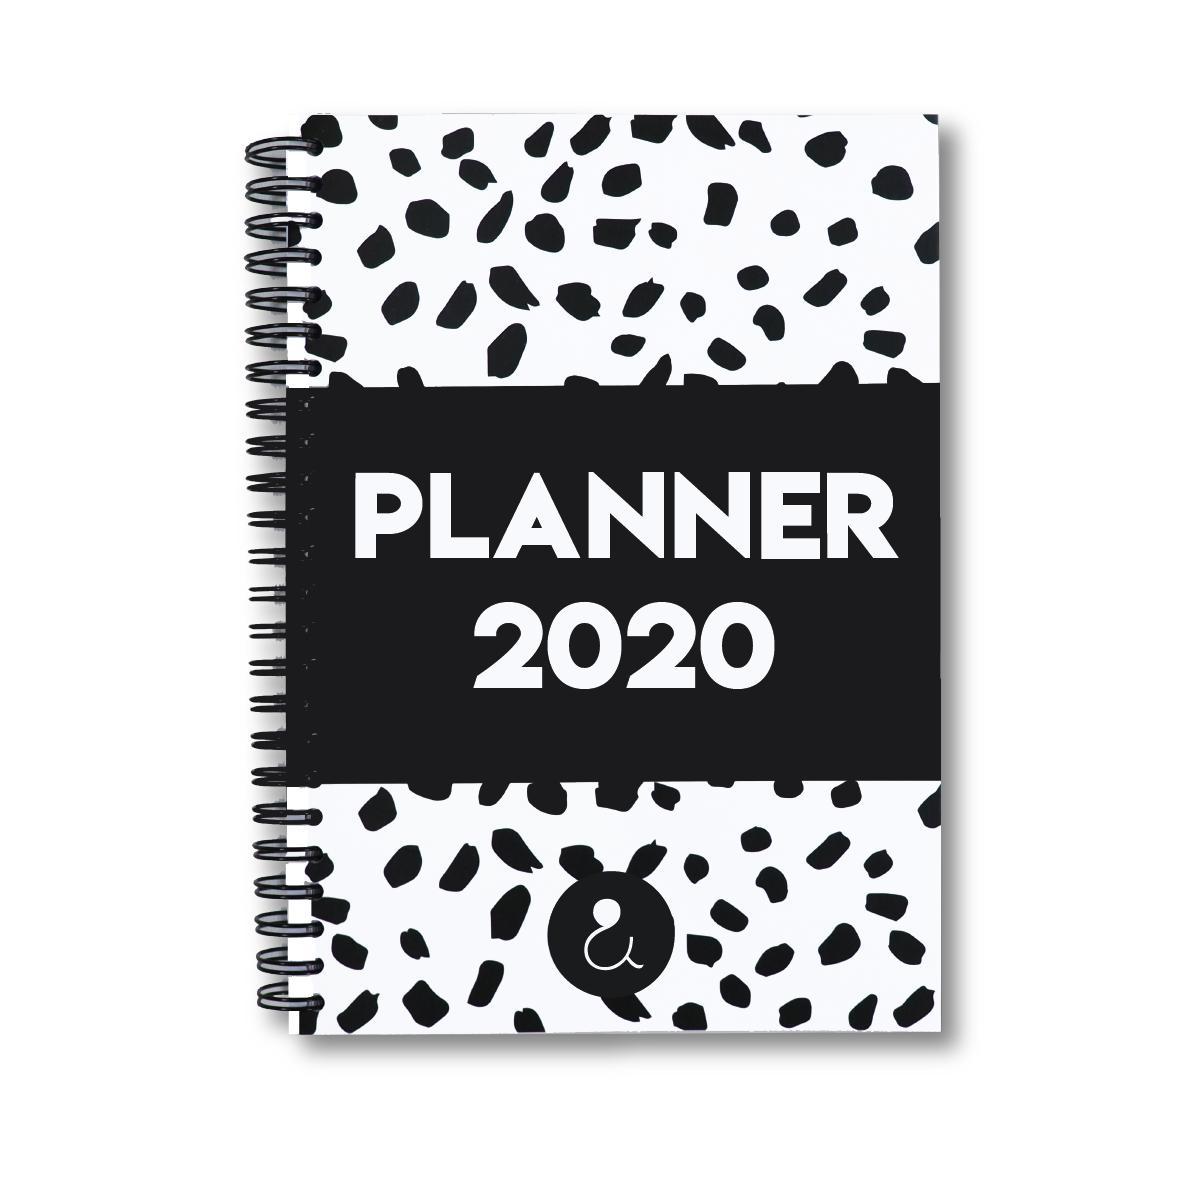 planner-2020-mono-vs_tekengebied1